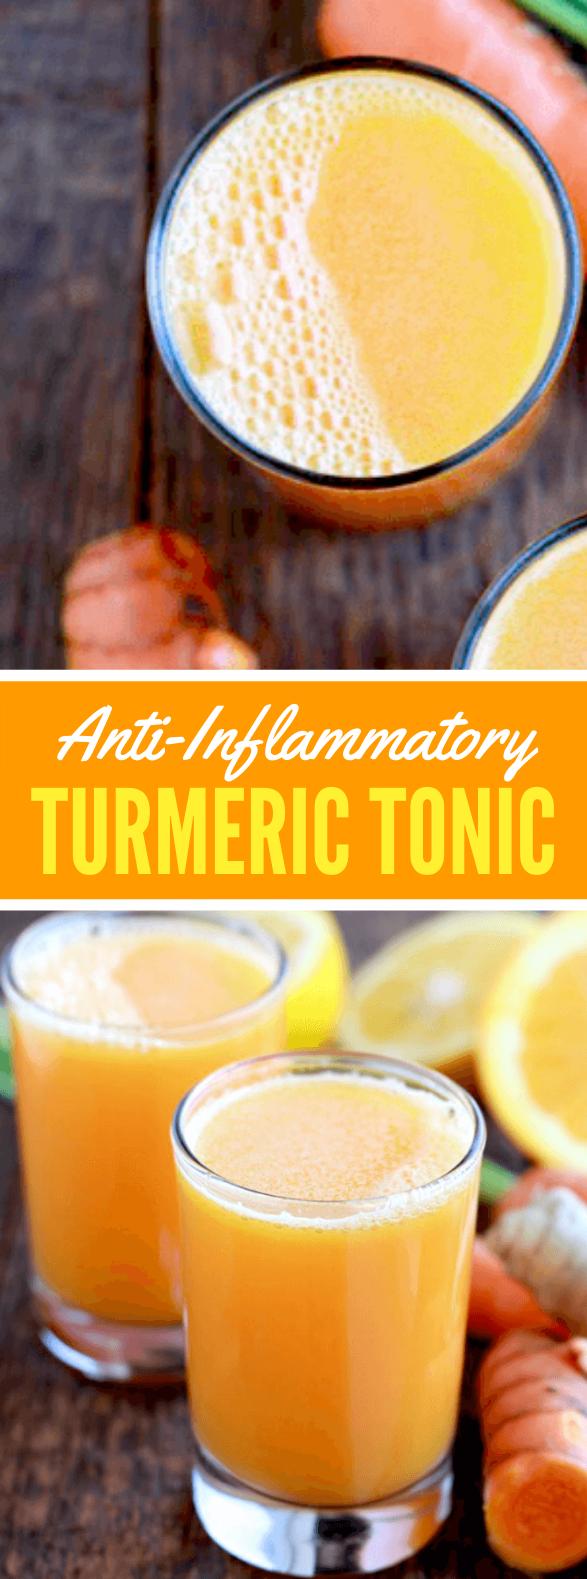 ANTI-INFLAMMATORY TURMERIC TONIC #drinks #healthy